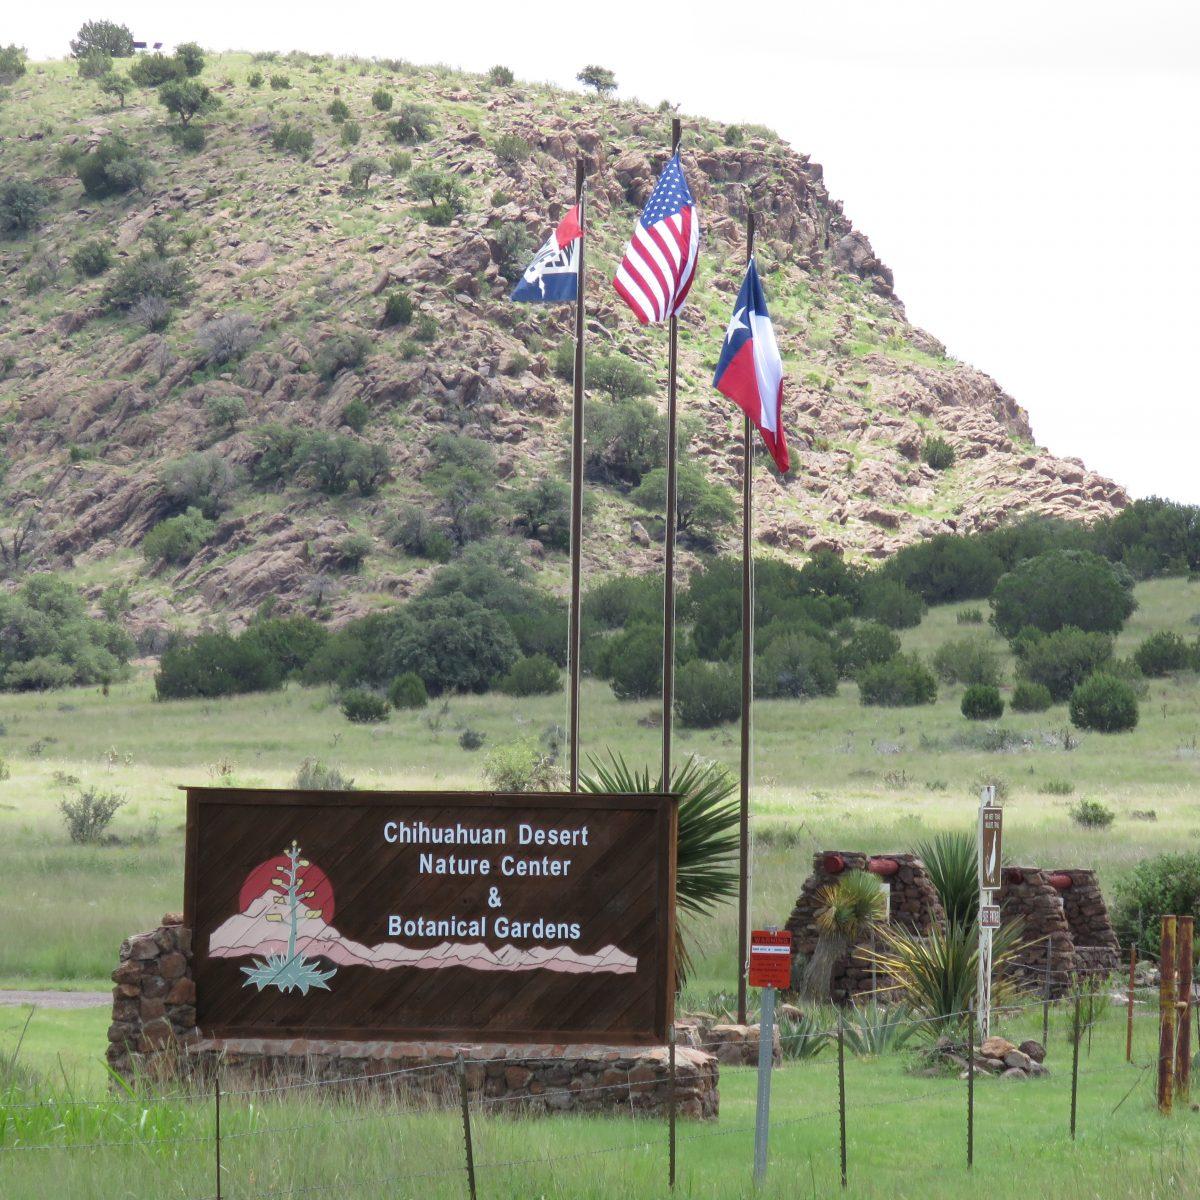 Chihuahuan Desert Nature Center & Botanical Gardens